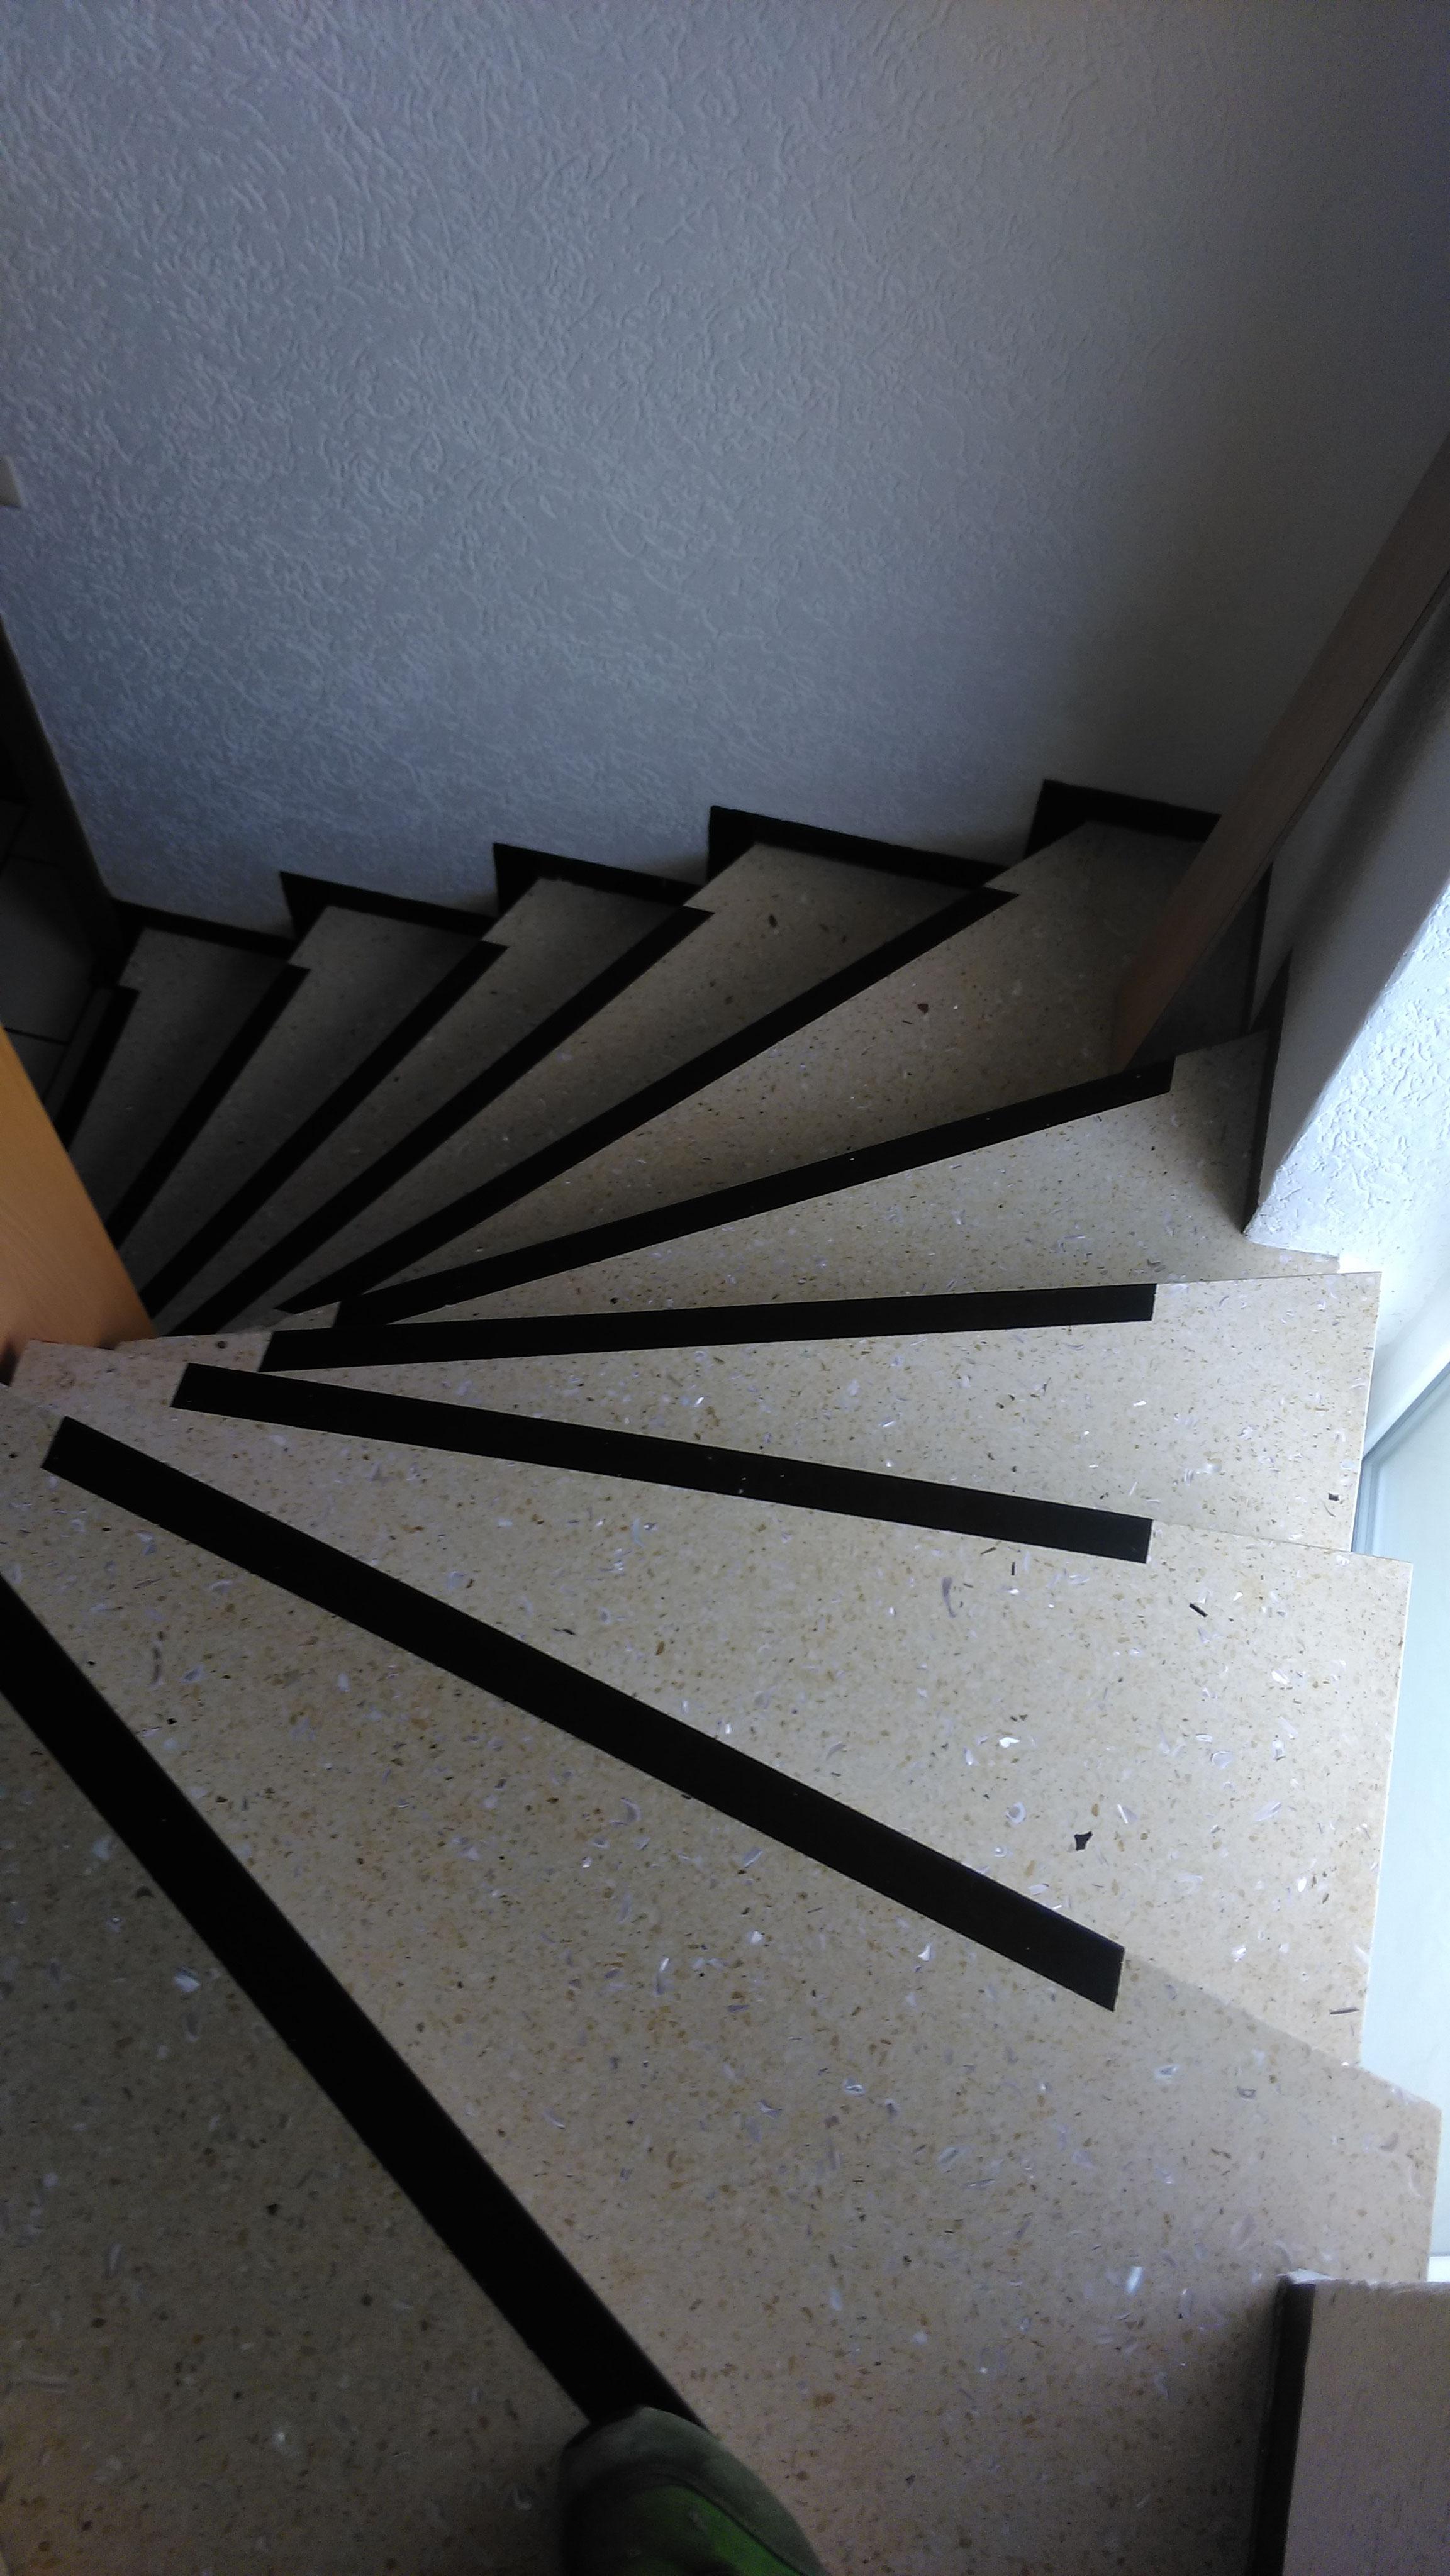 wundersch nen treppe mit vinyl bekleben haus design ideen. Black Bedroom Furniture Sets. Home Design Ideas